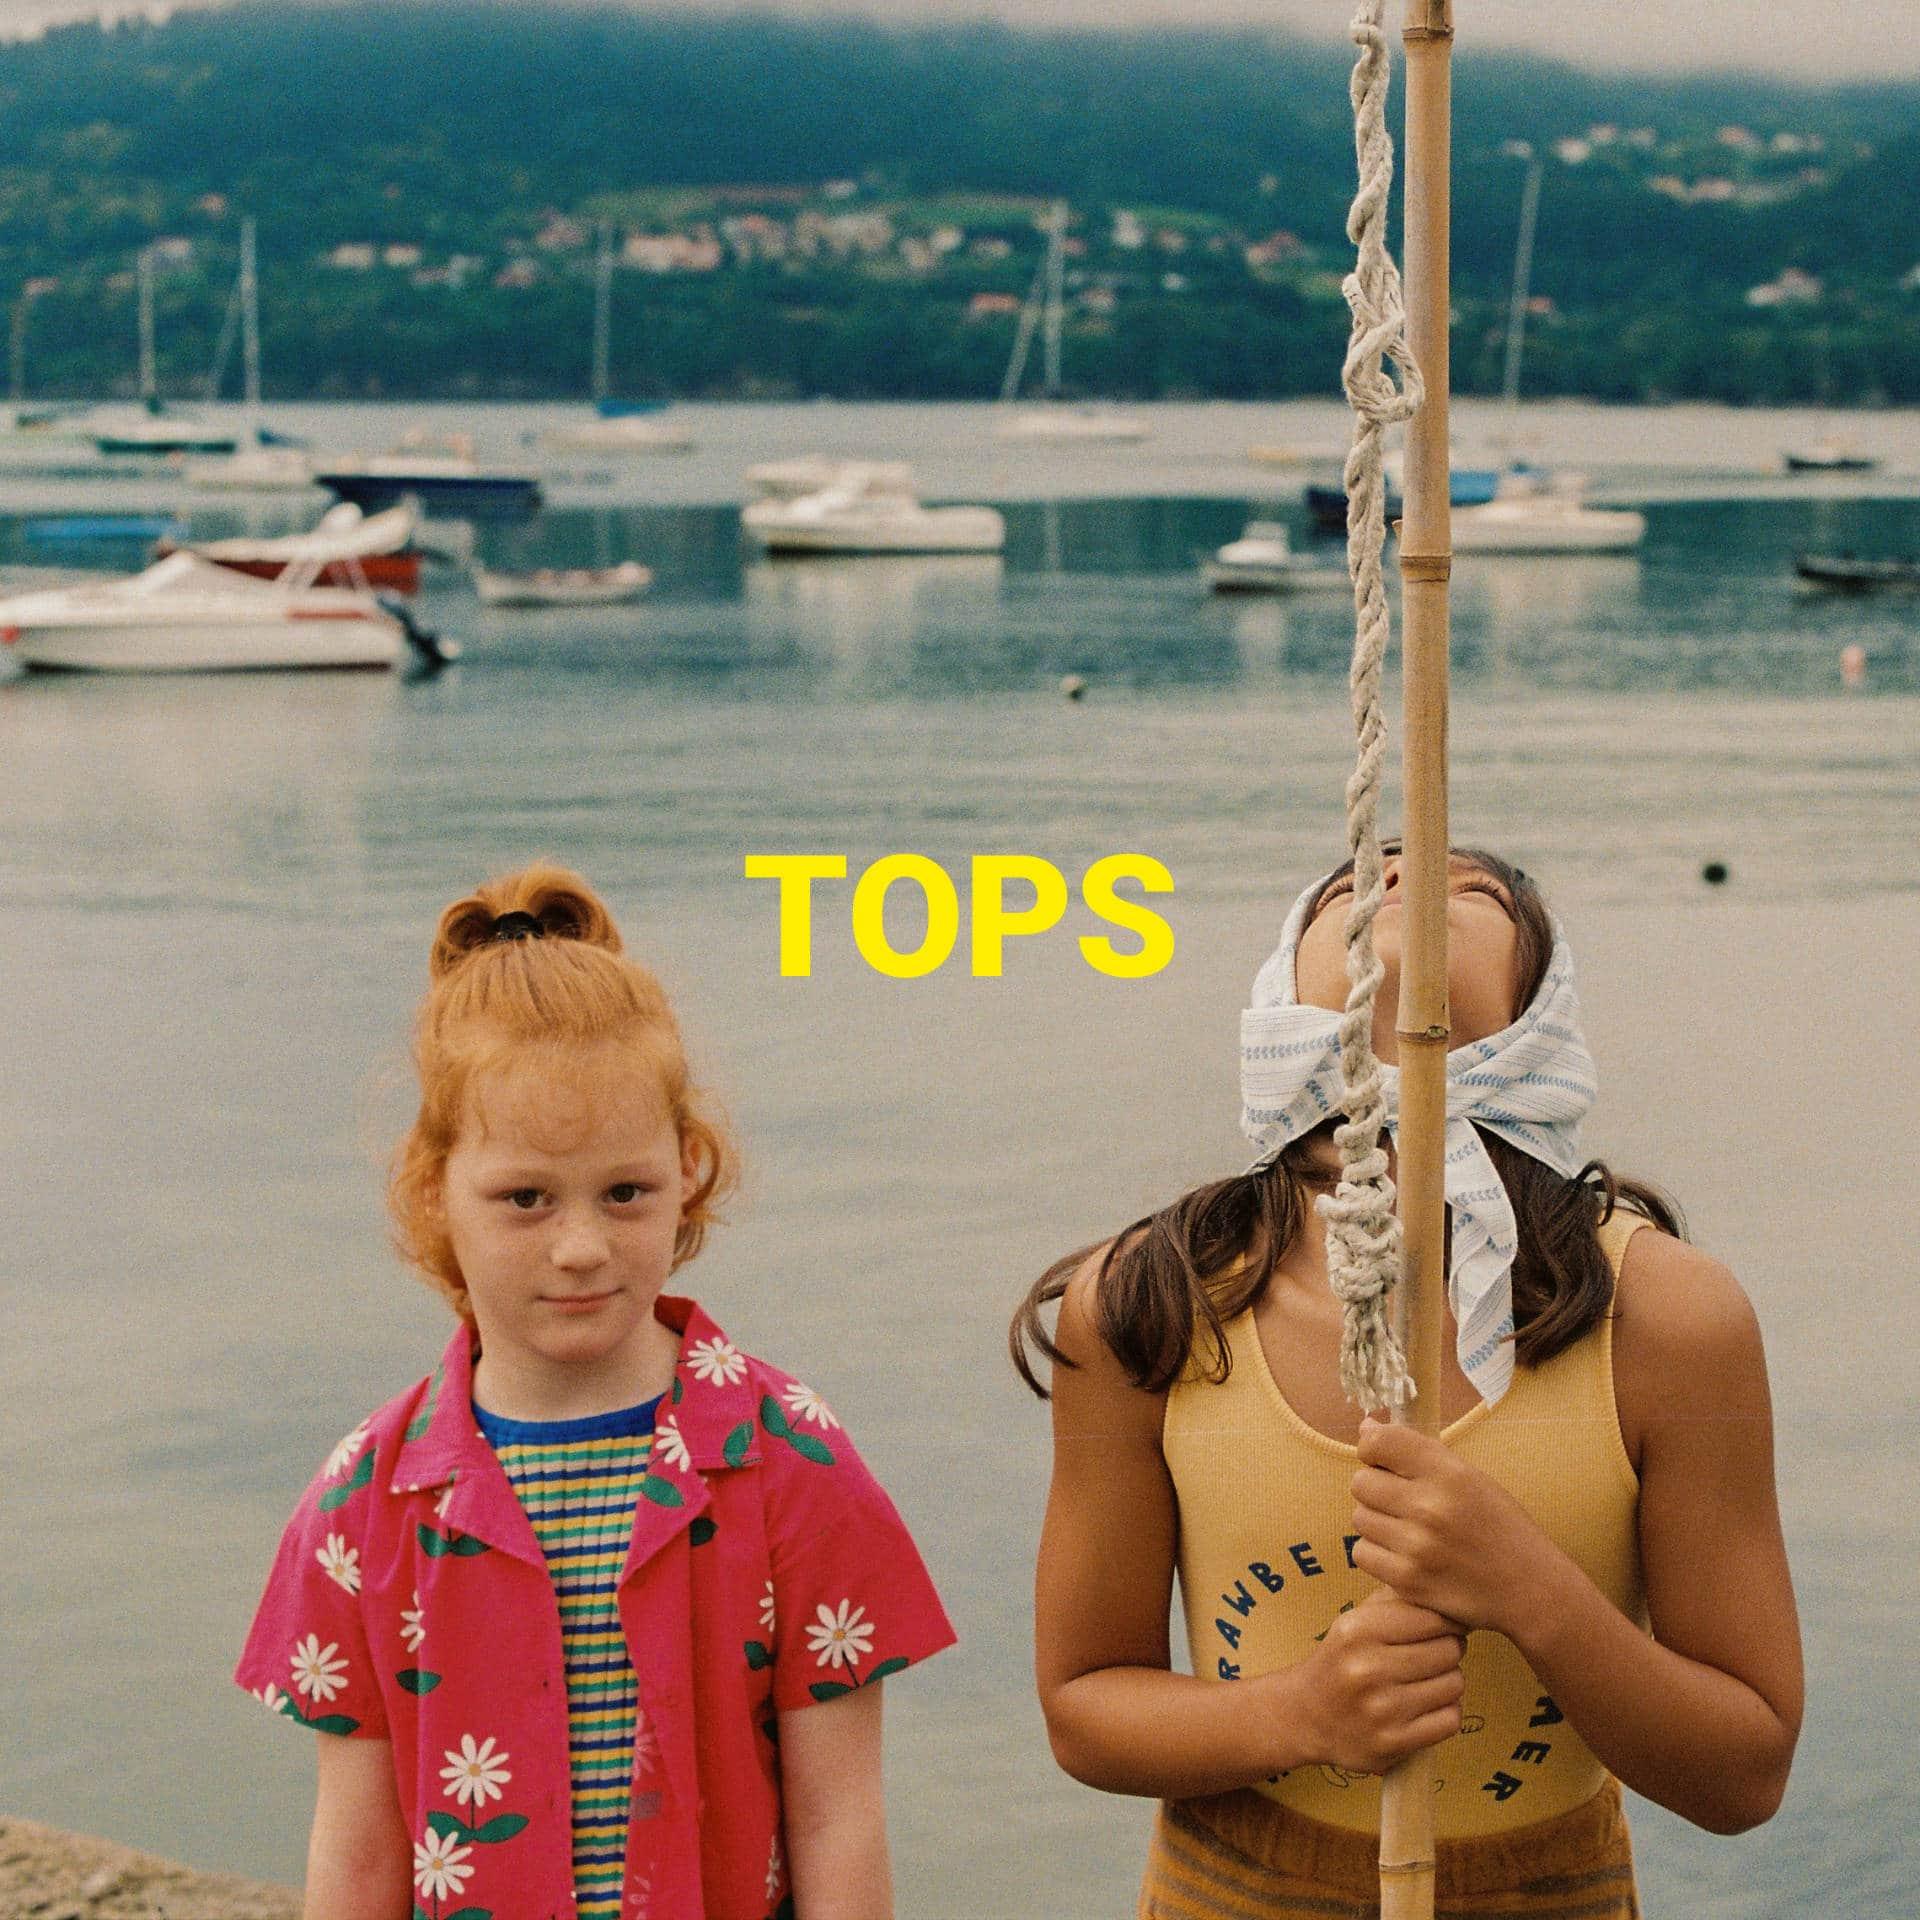 The Campamento - Verbena - Tops